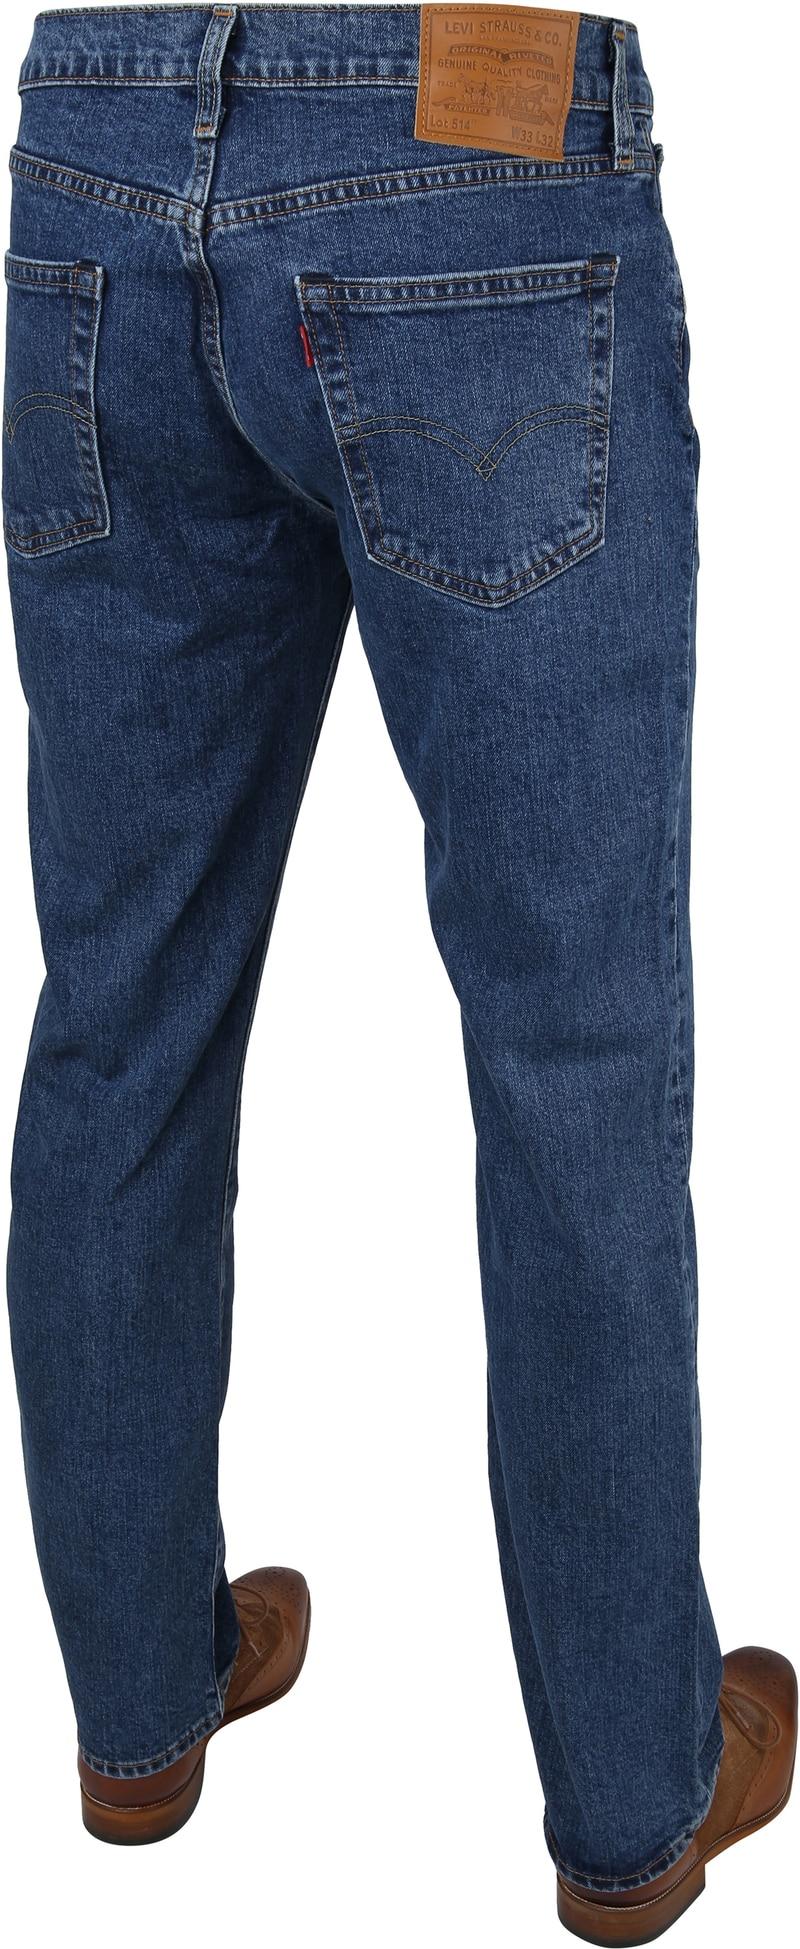 Levi's 514 Jeans Regular Fit Stonewash foto 3